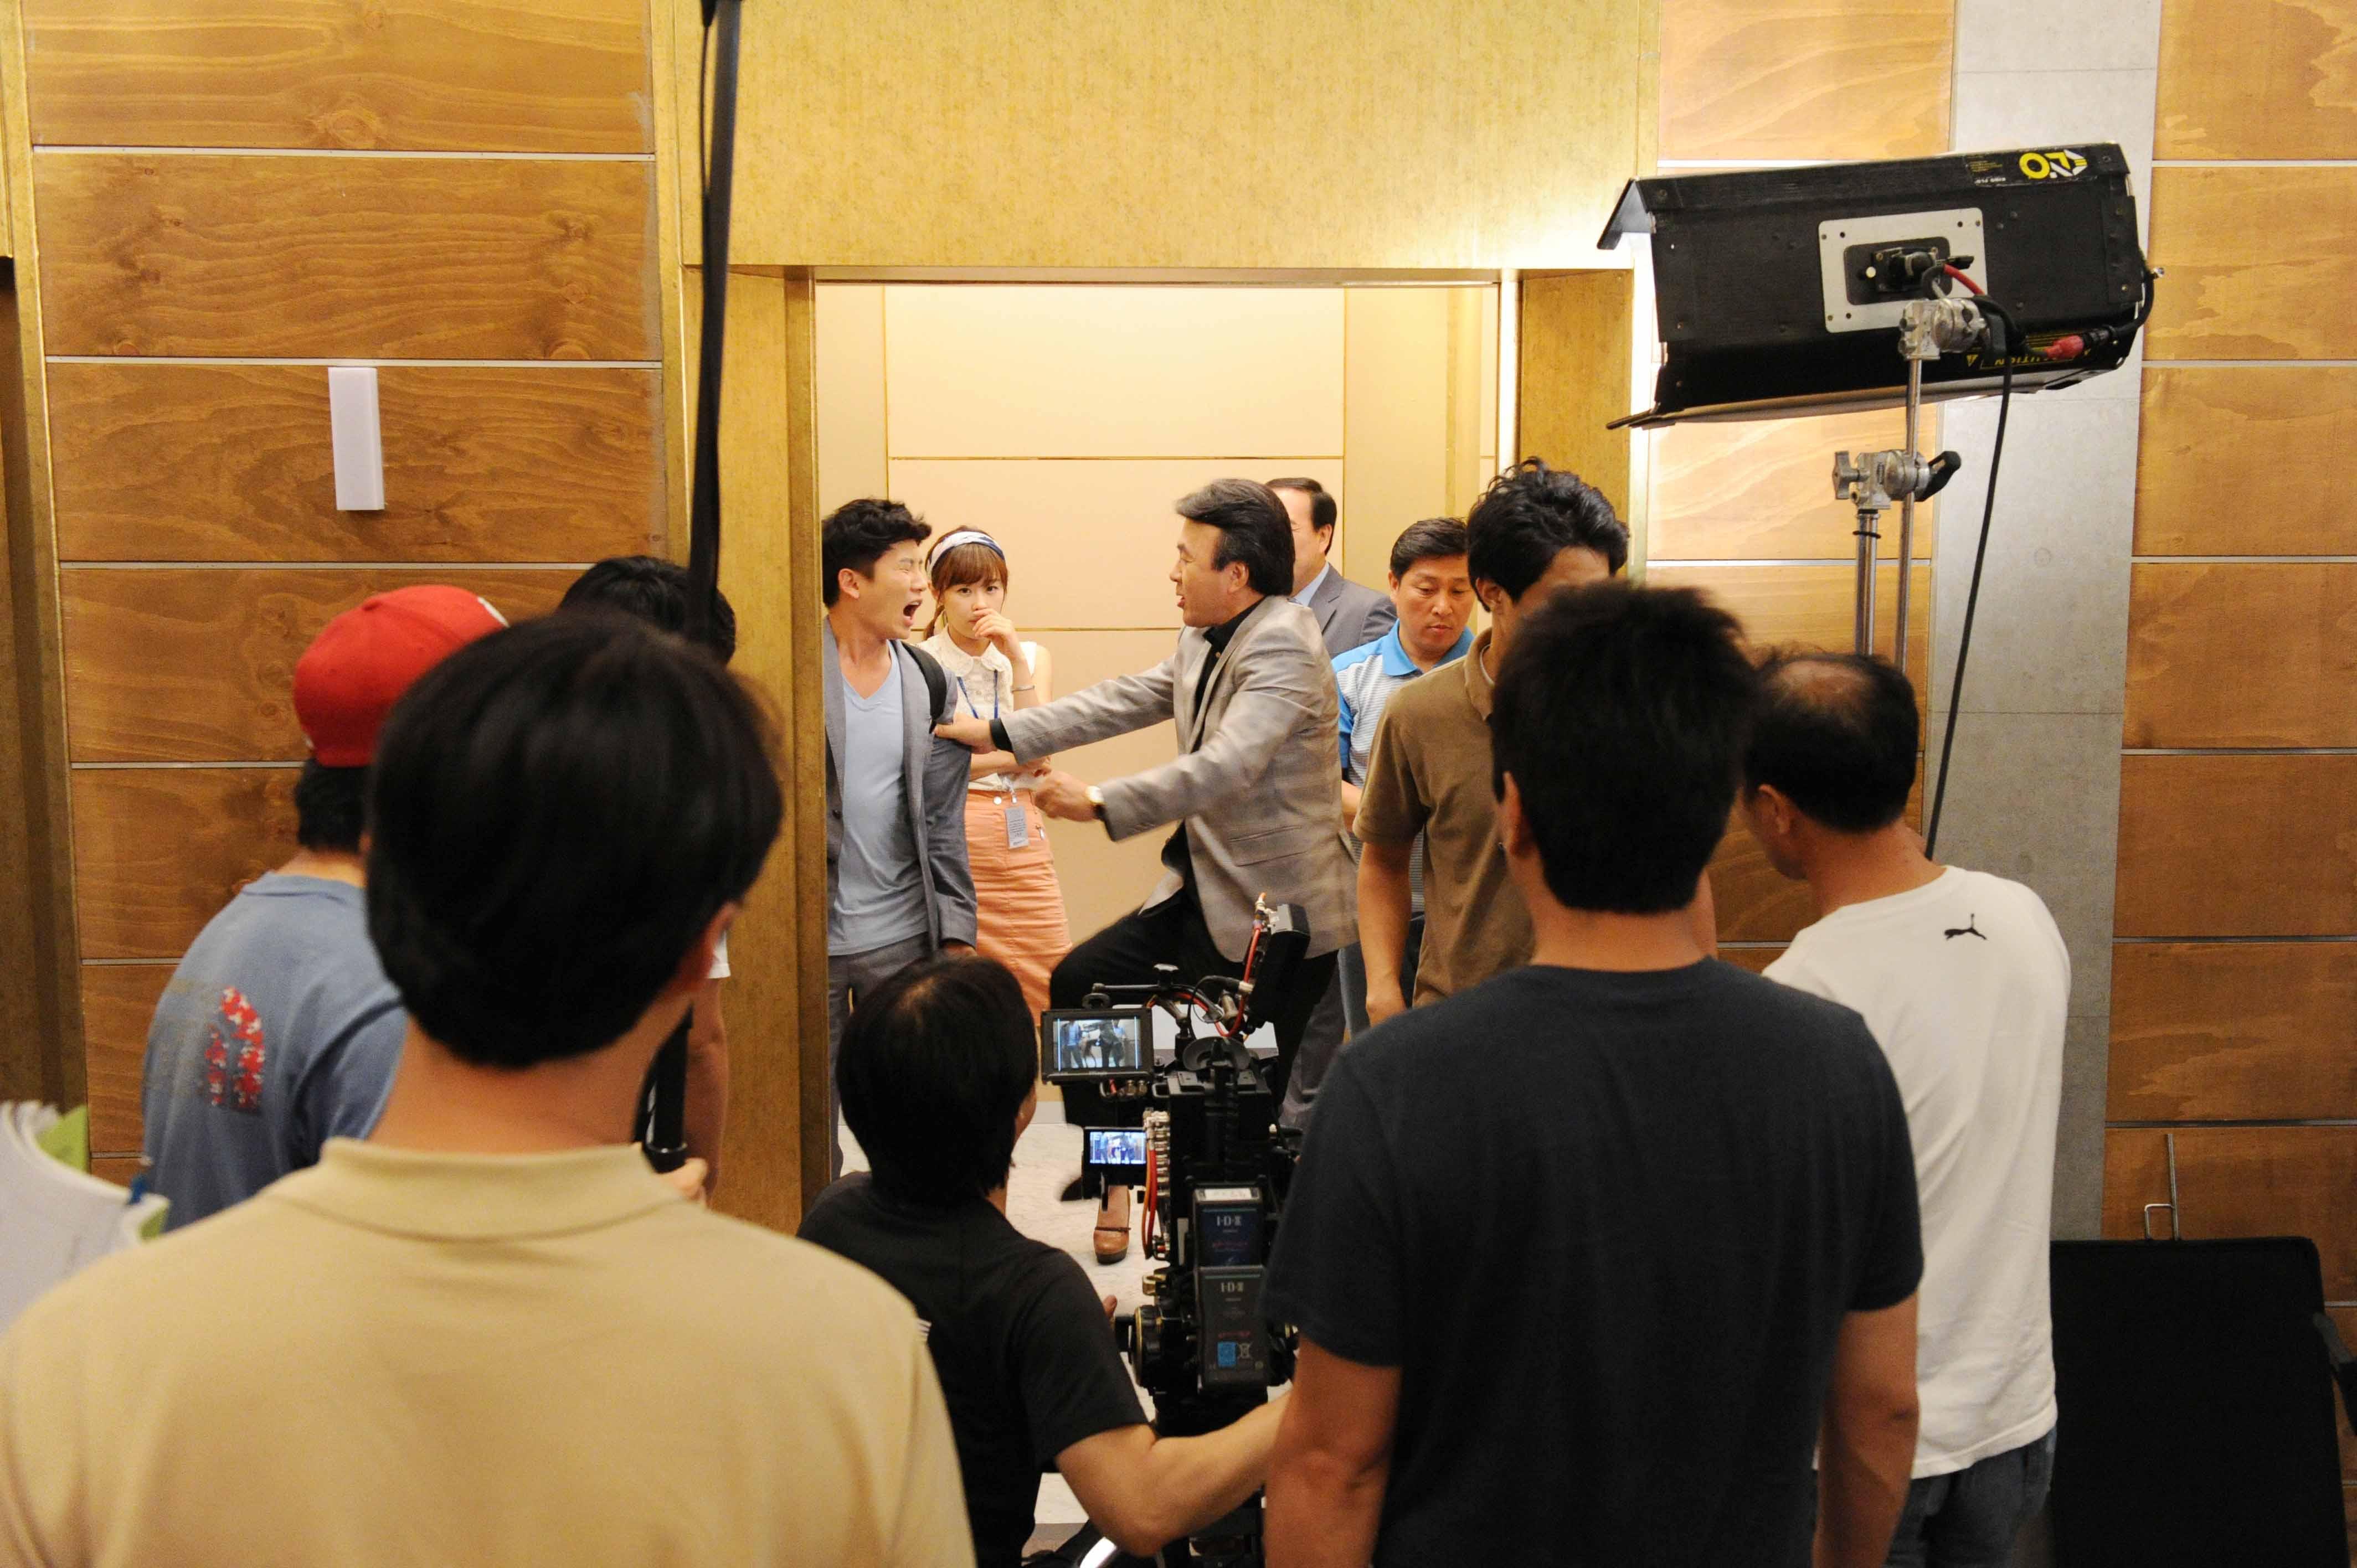 Protect the boss korean drama episode 3 recap / Mr bean